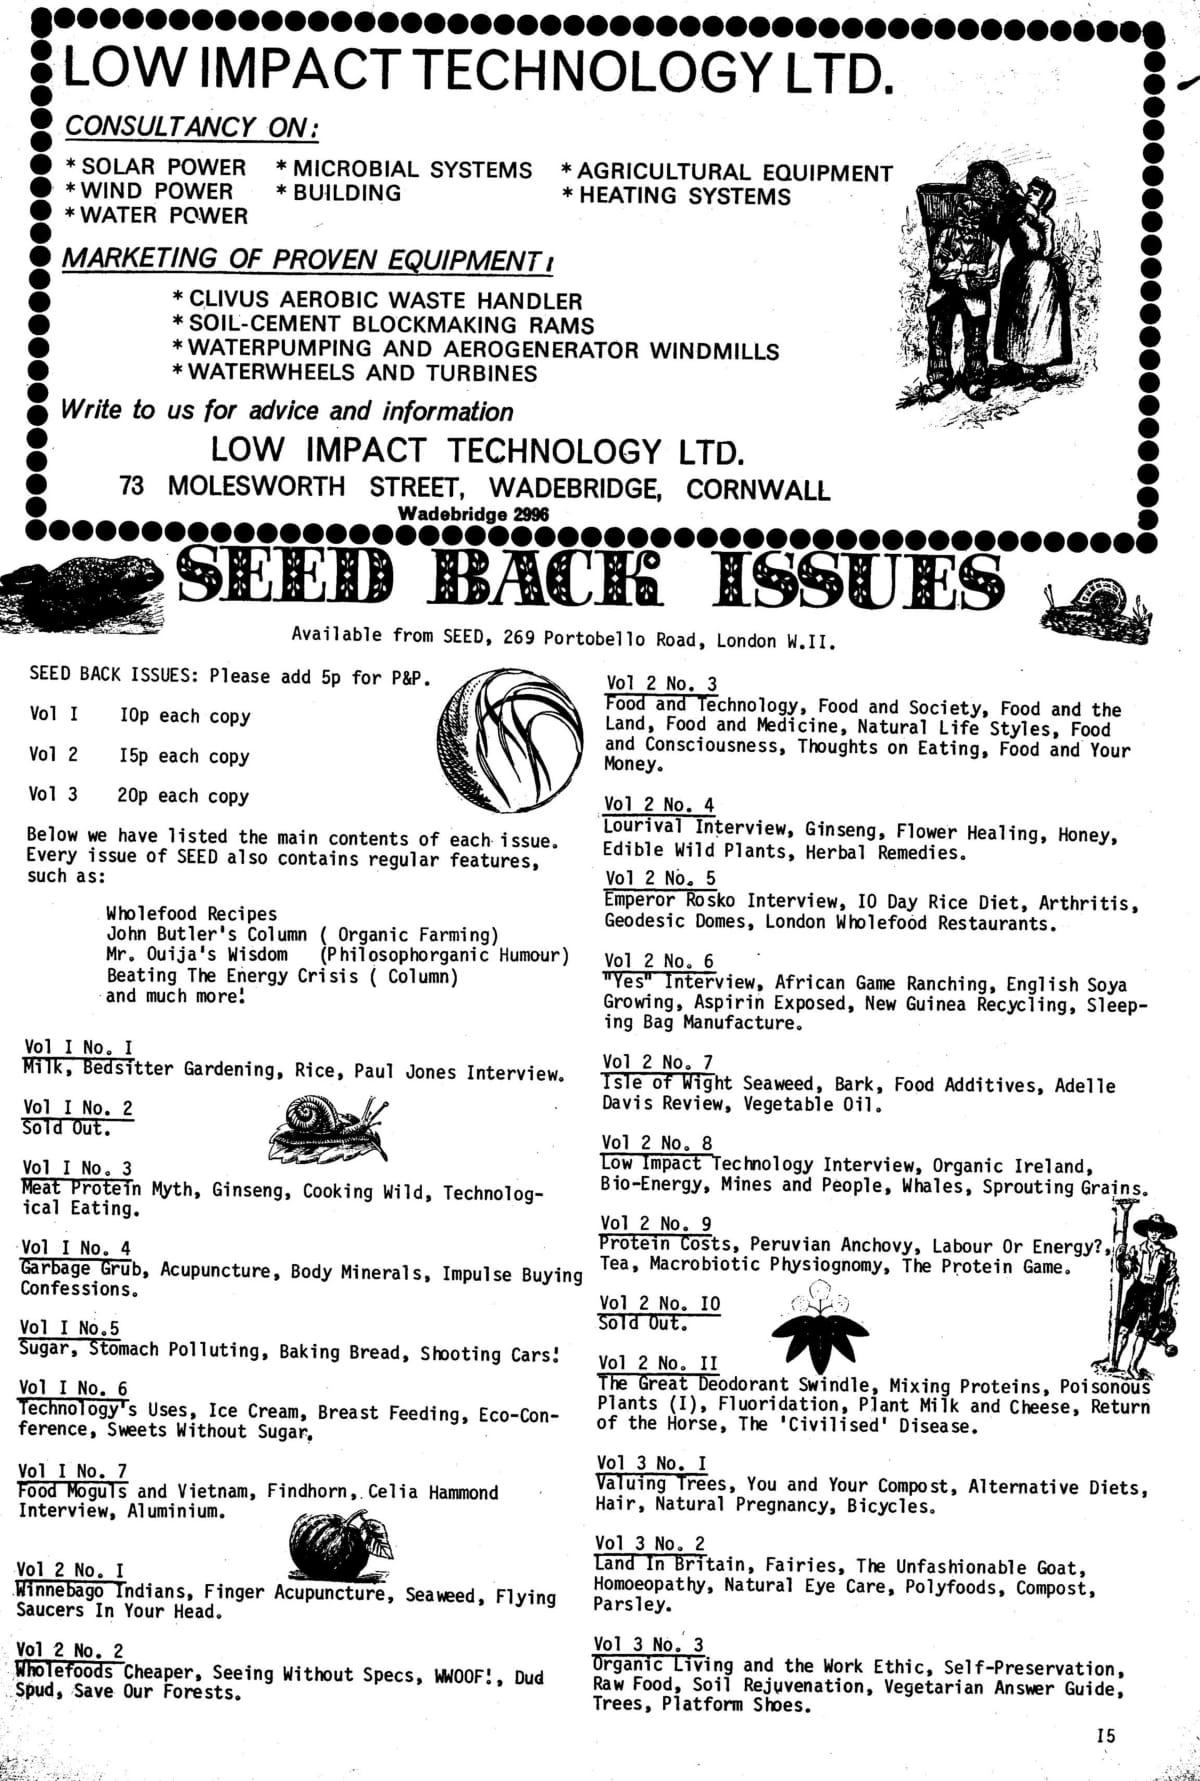 seed-v3-n4-april1974-16.jpg